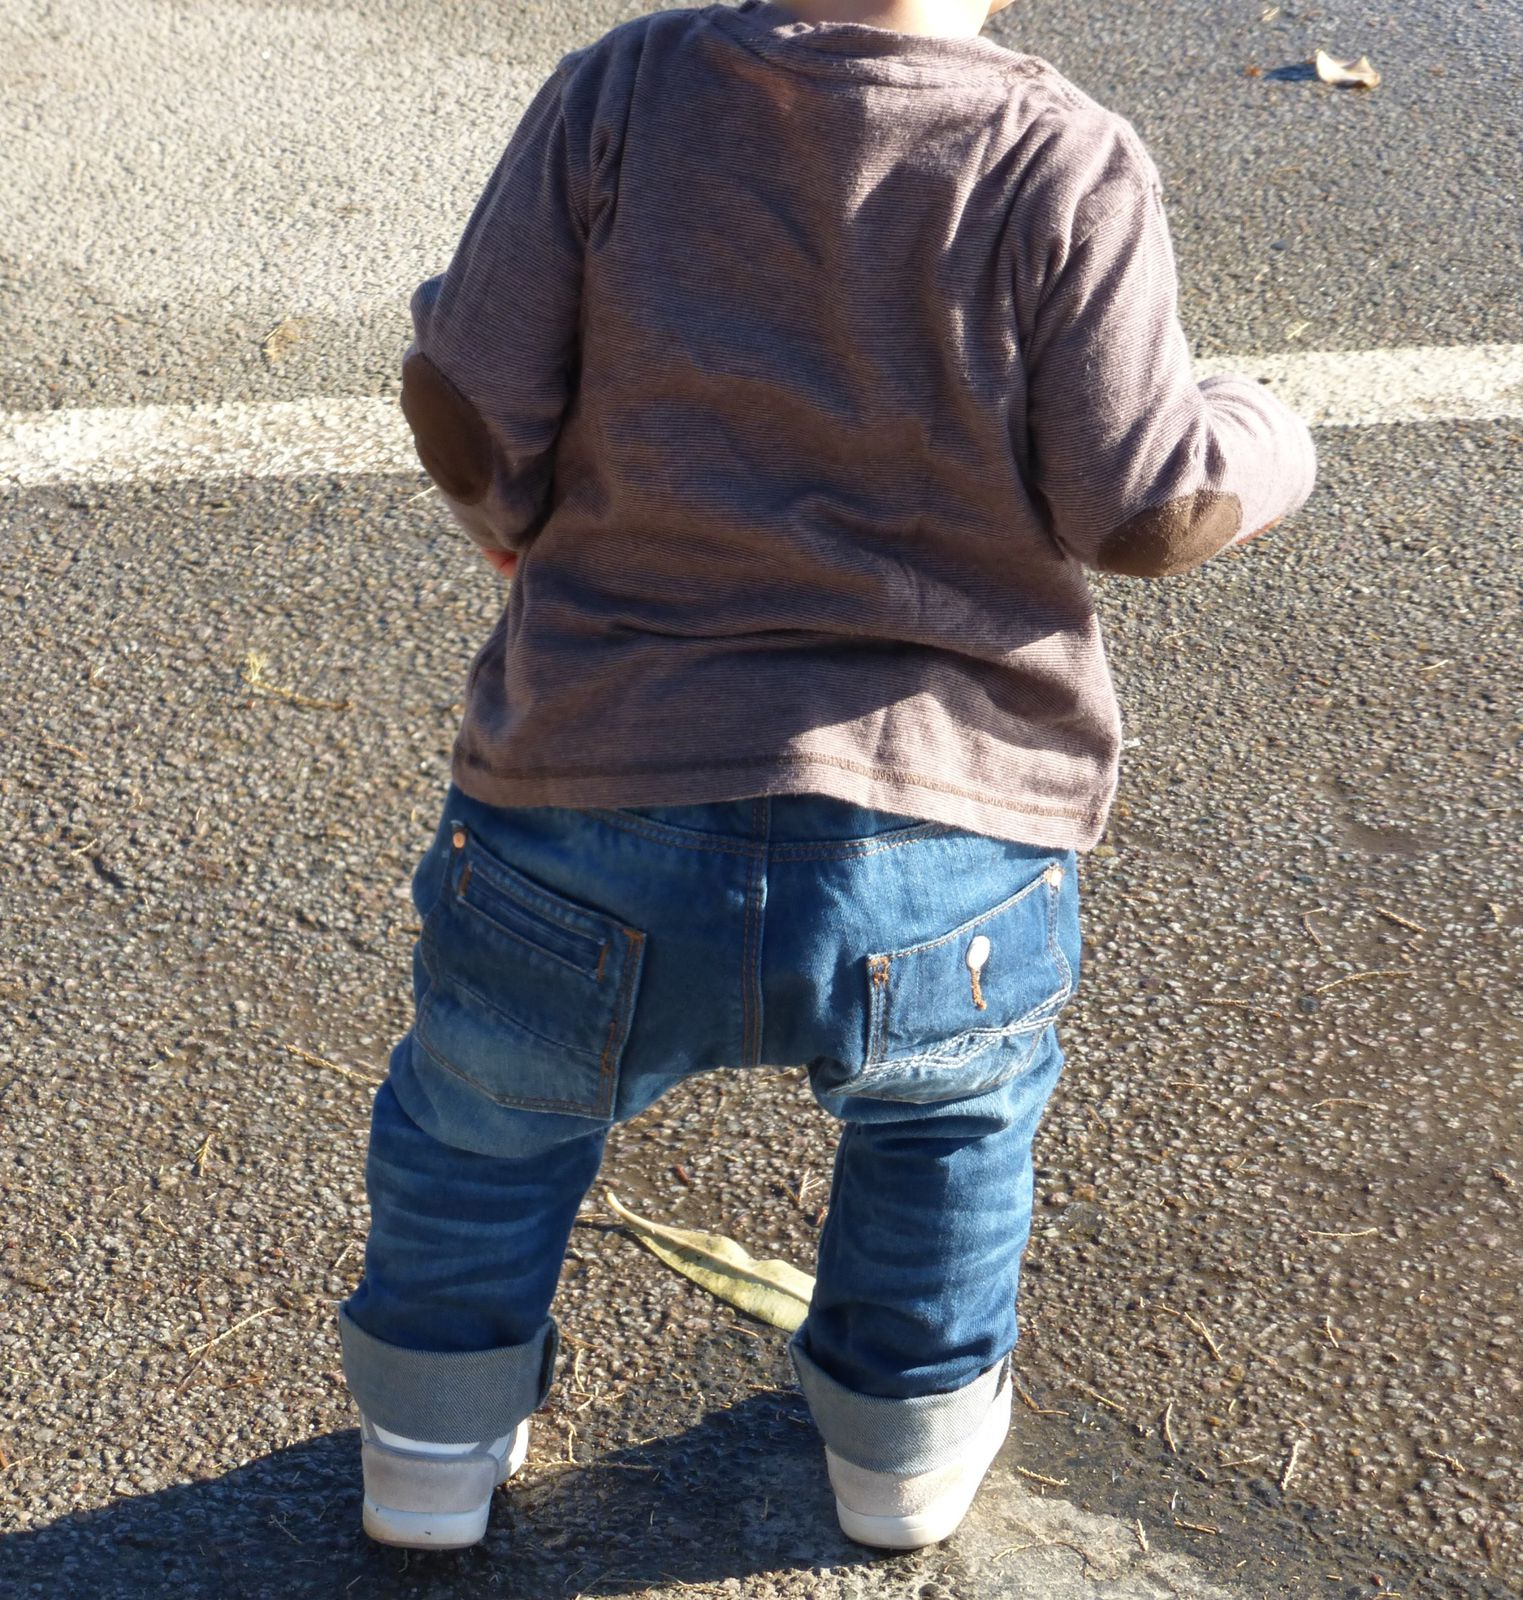 Tee-shirt marron à coudières zara Baby, jean sarouel Zara Baby, baskets Zara. (n'apparaissent plus sur le site de zara)